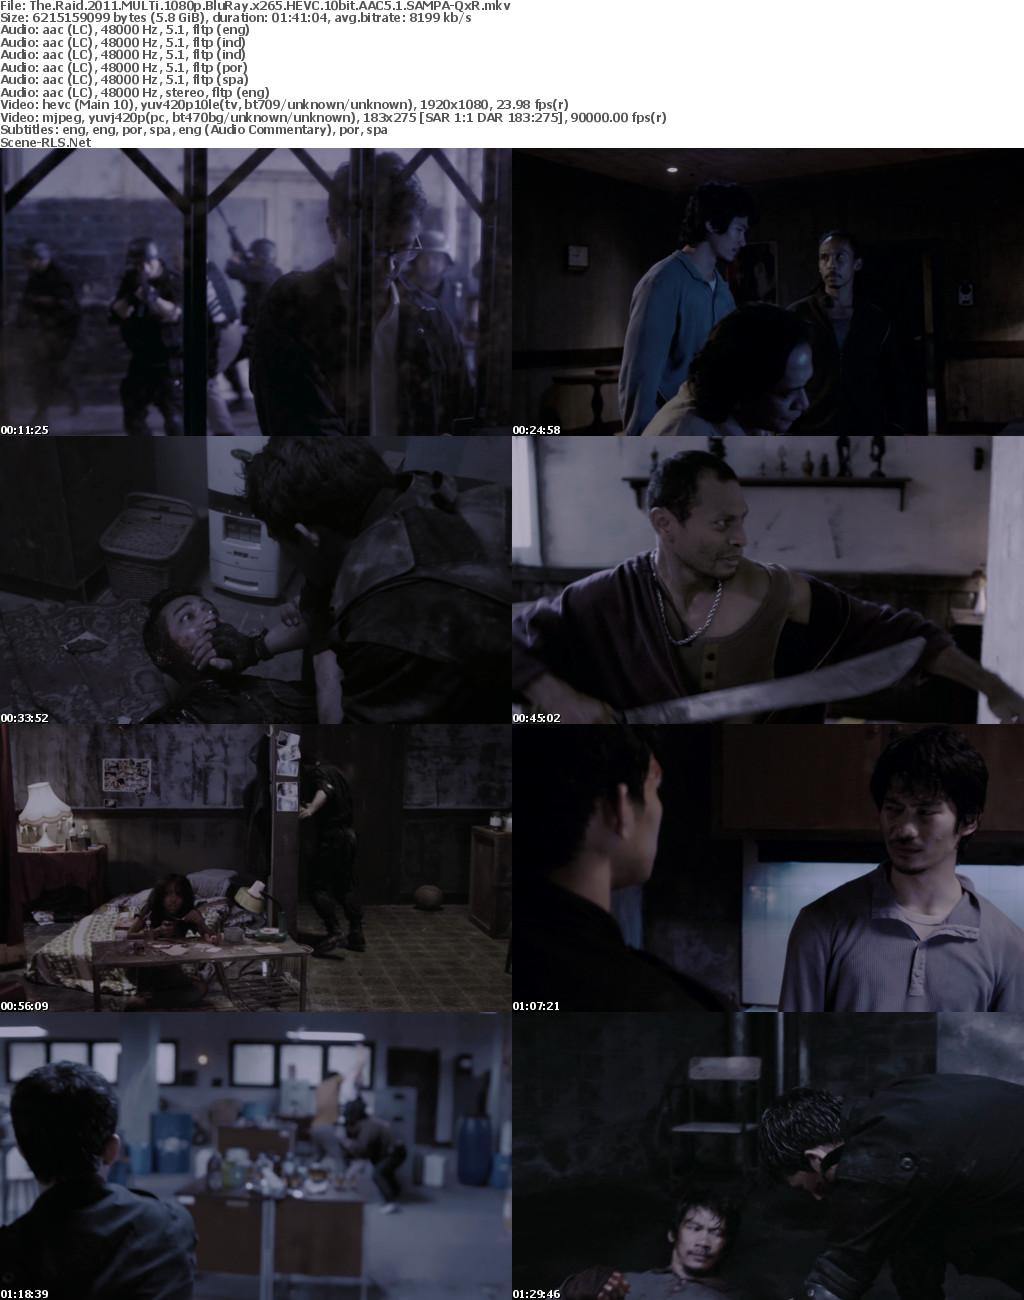 The Raid-Redemption 2011 MULTi 1080p BluRay x265 HEVC 10bit AAC5 1